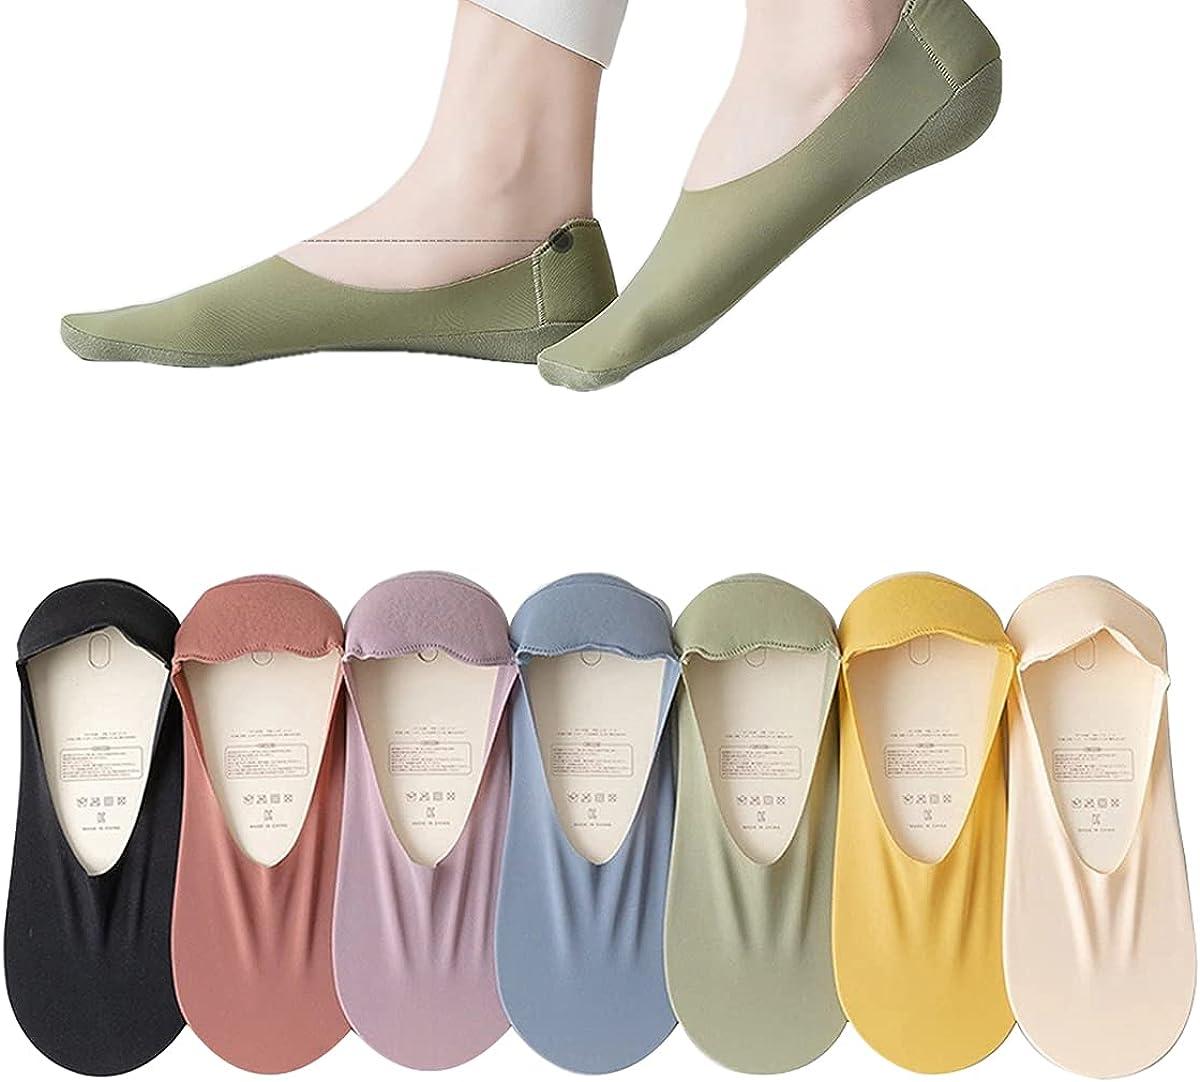 Womens No Show Thin Socks Cotton Nylon Low Cut Liner Non Slip hidden Invisible Socks with heel protect pad 5 Pairs (Random)